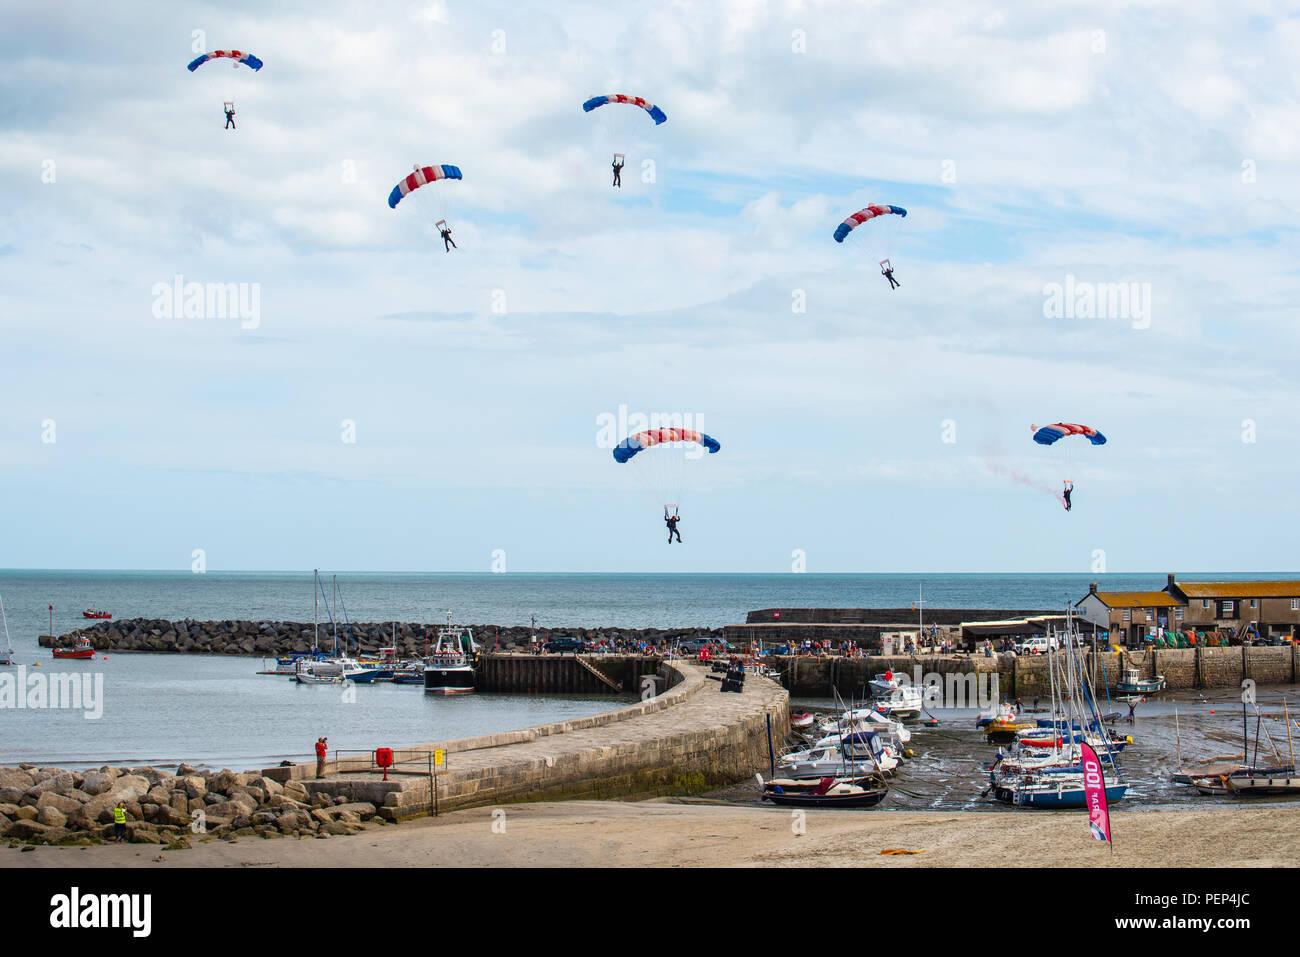 Lyme Regis, Dorset, UK  16th August 2018  UK Weather: Warm sunny